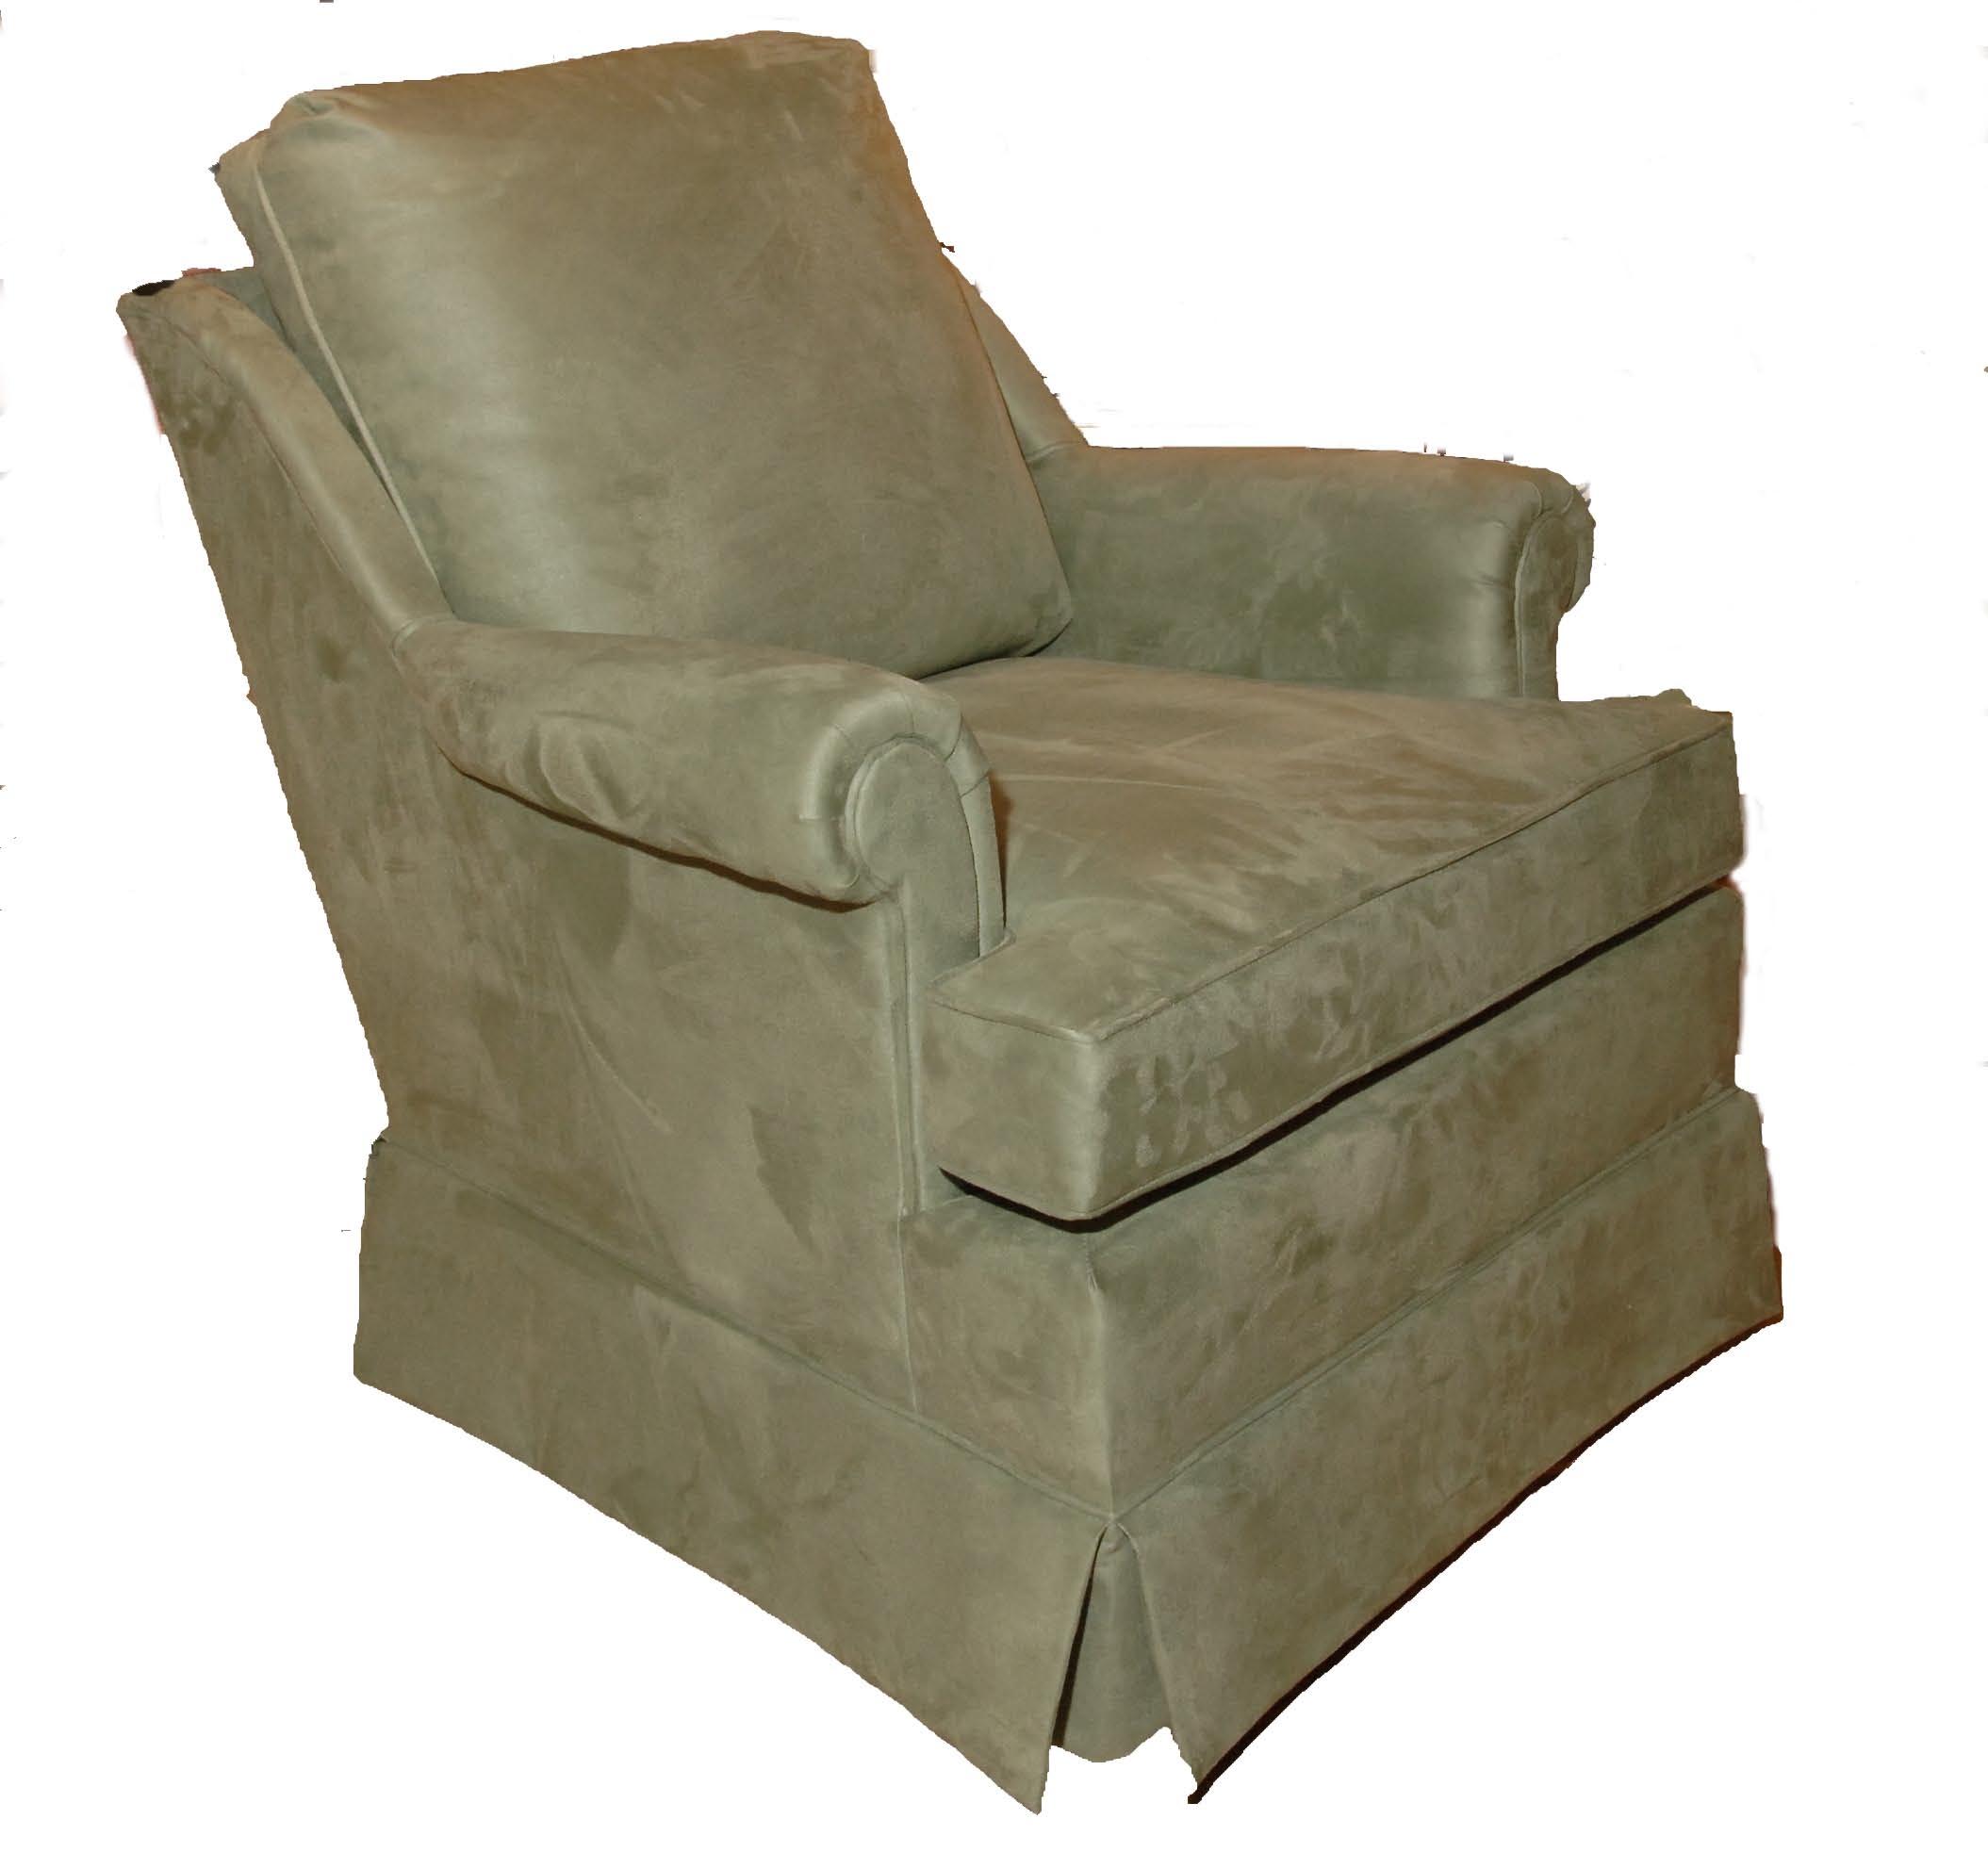 Virginia wayside furniture in richmond va 804 740 3 for Wayside furniture